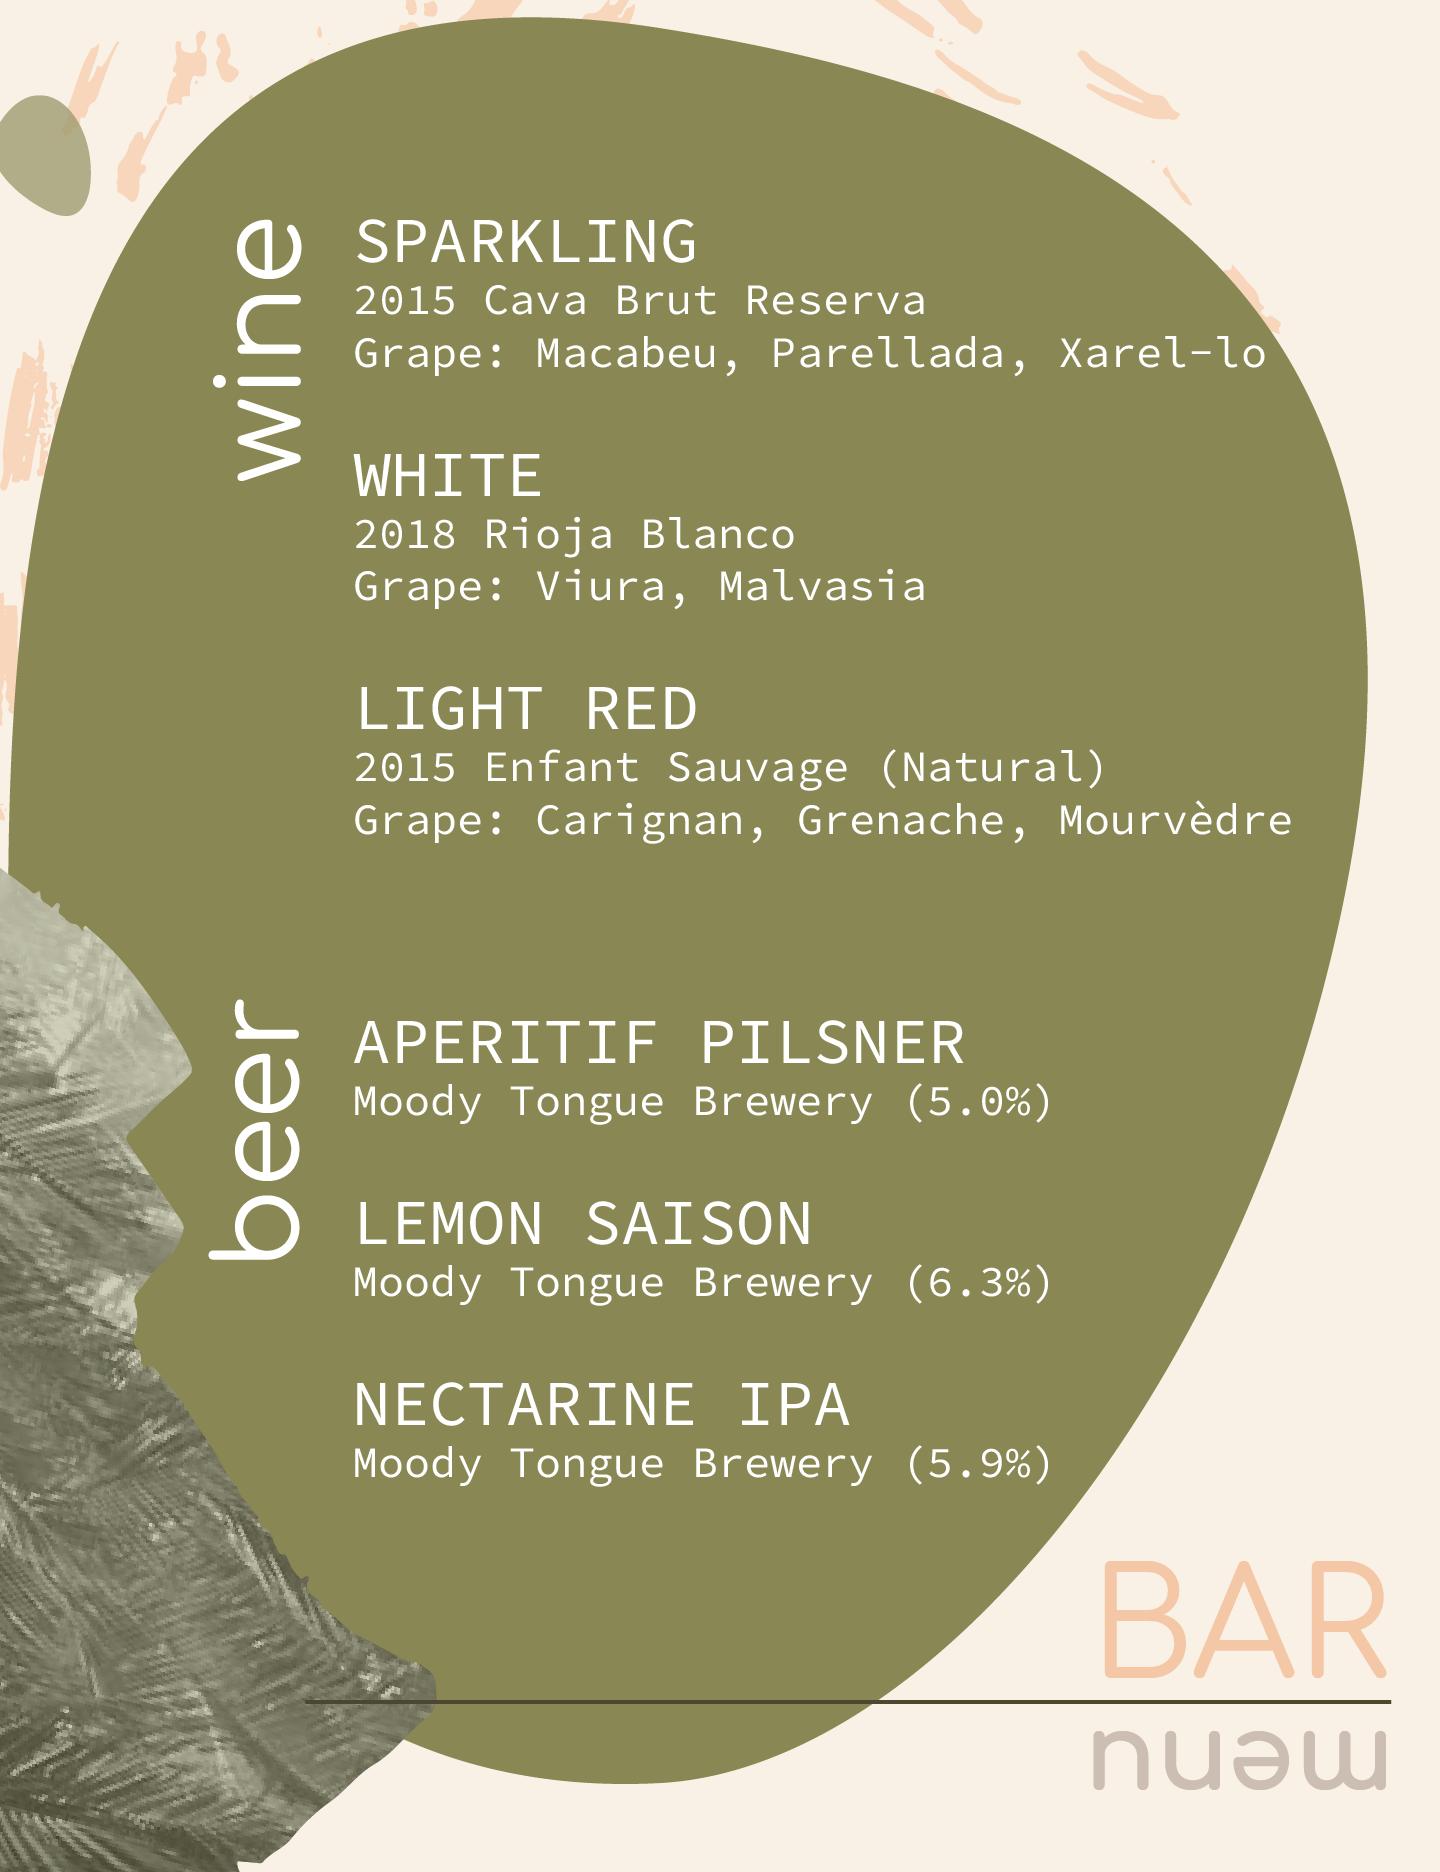 bar menu@2x.png